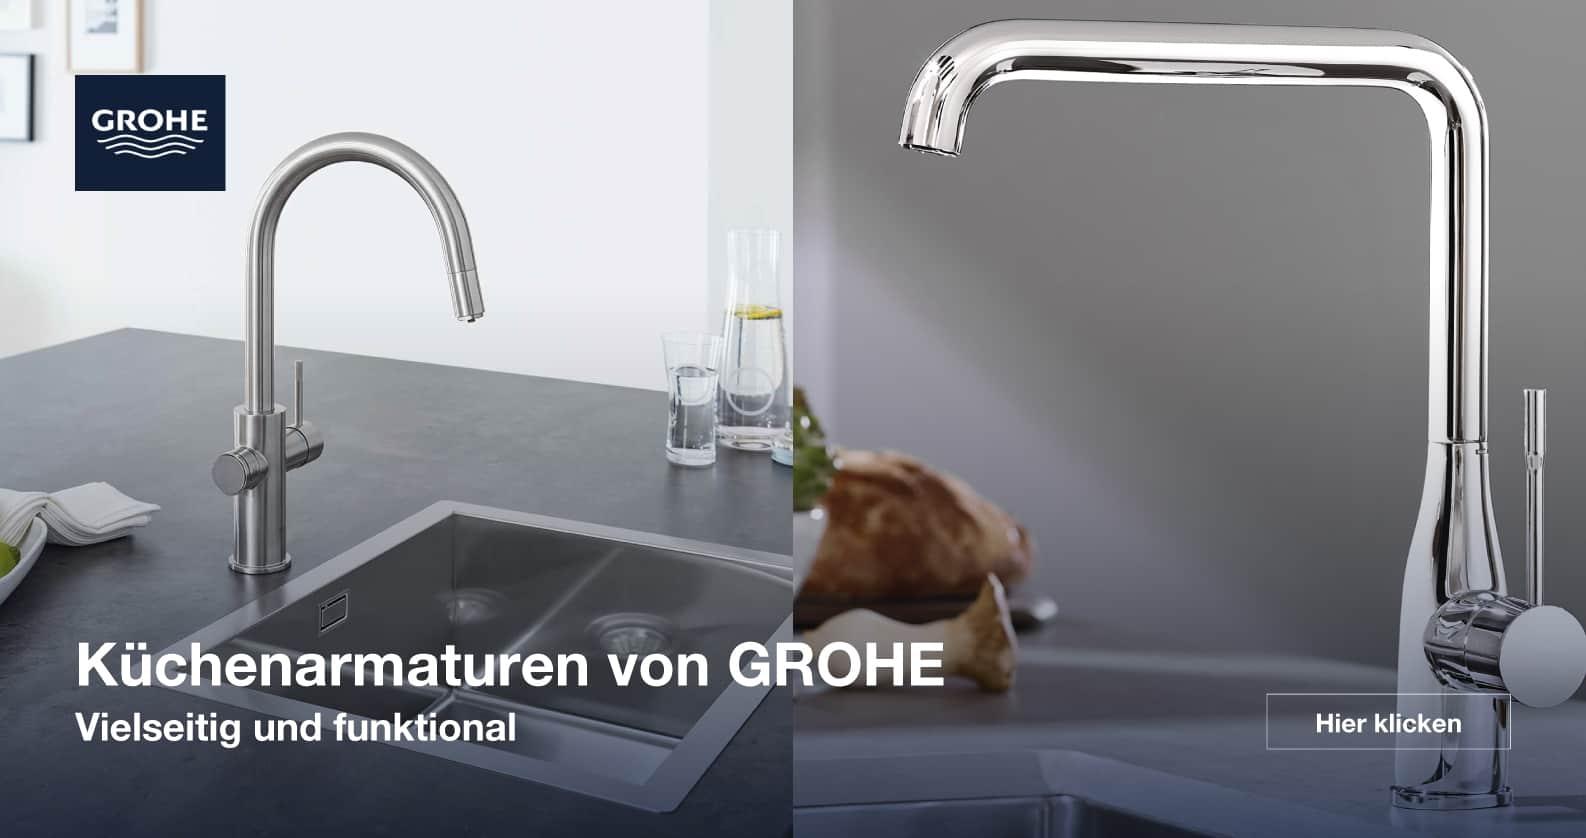 GROHE Küchenarmaturen